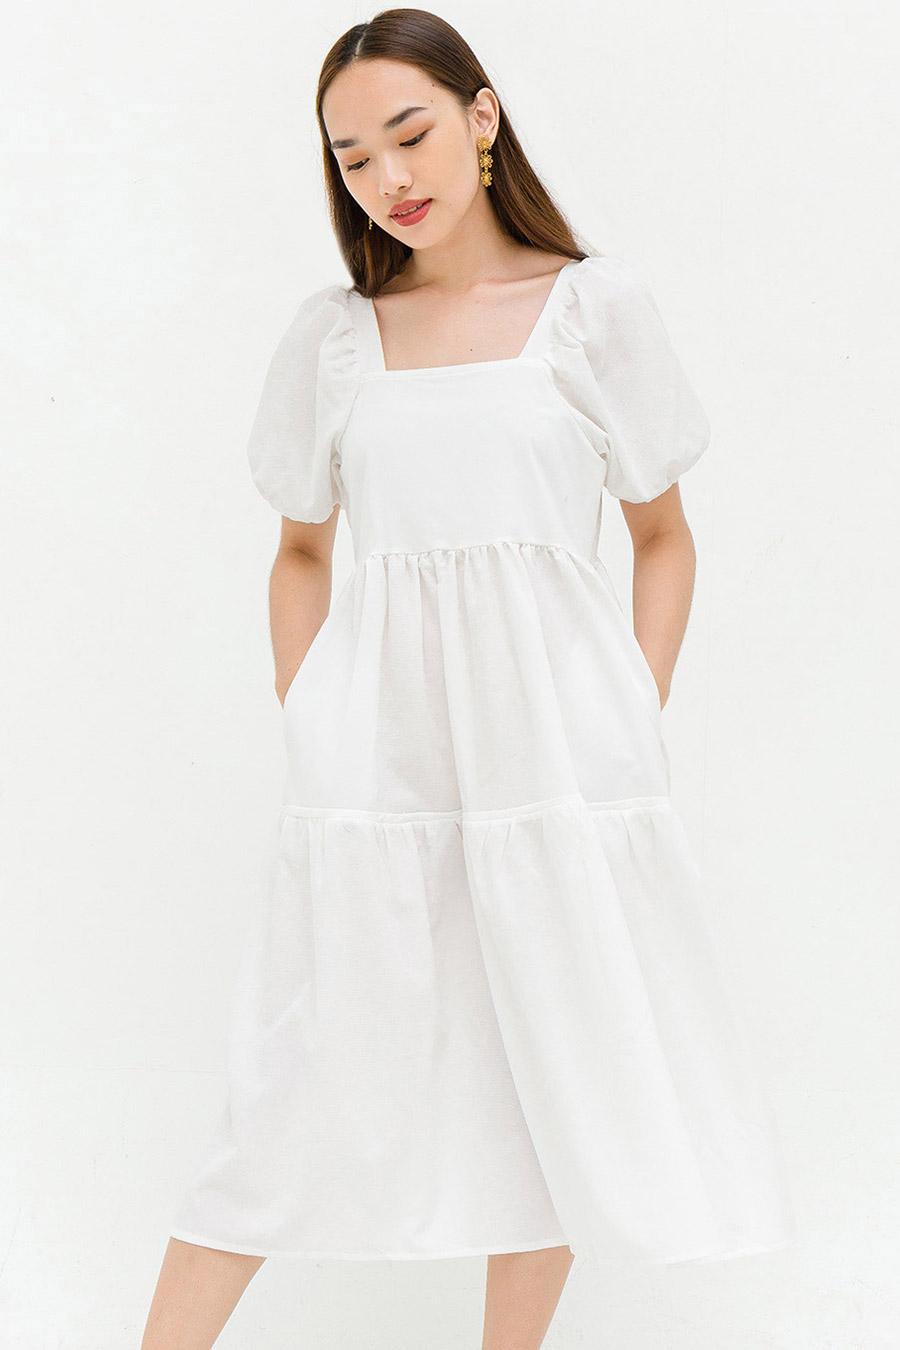 TYLER DRESS - IVORY